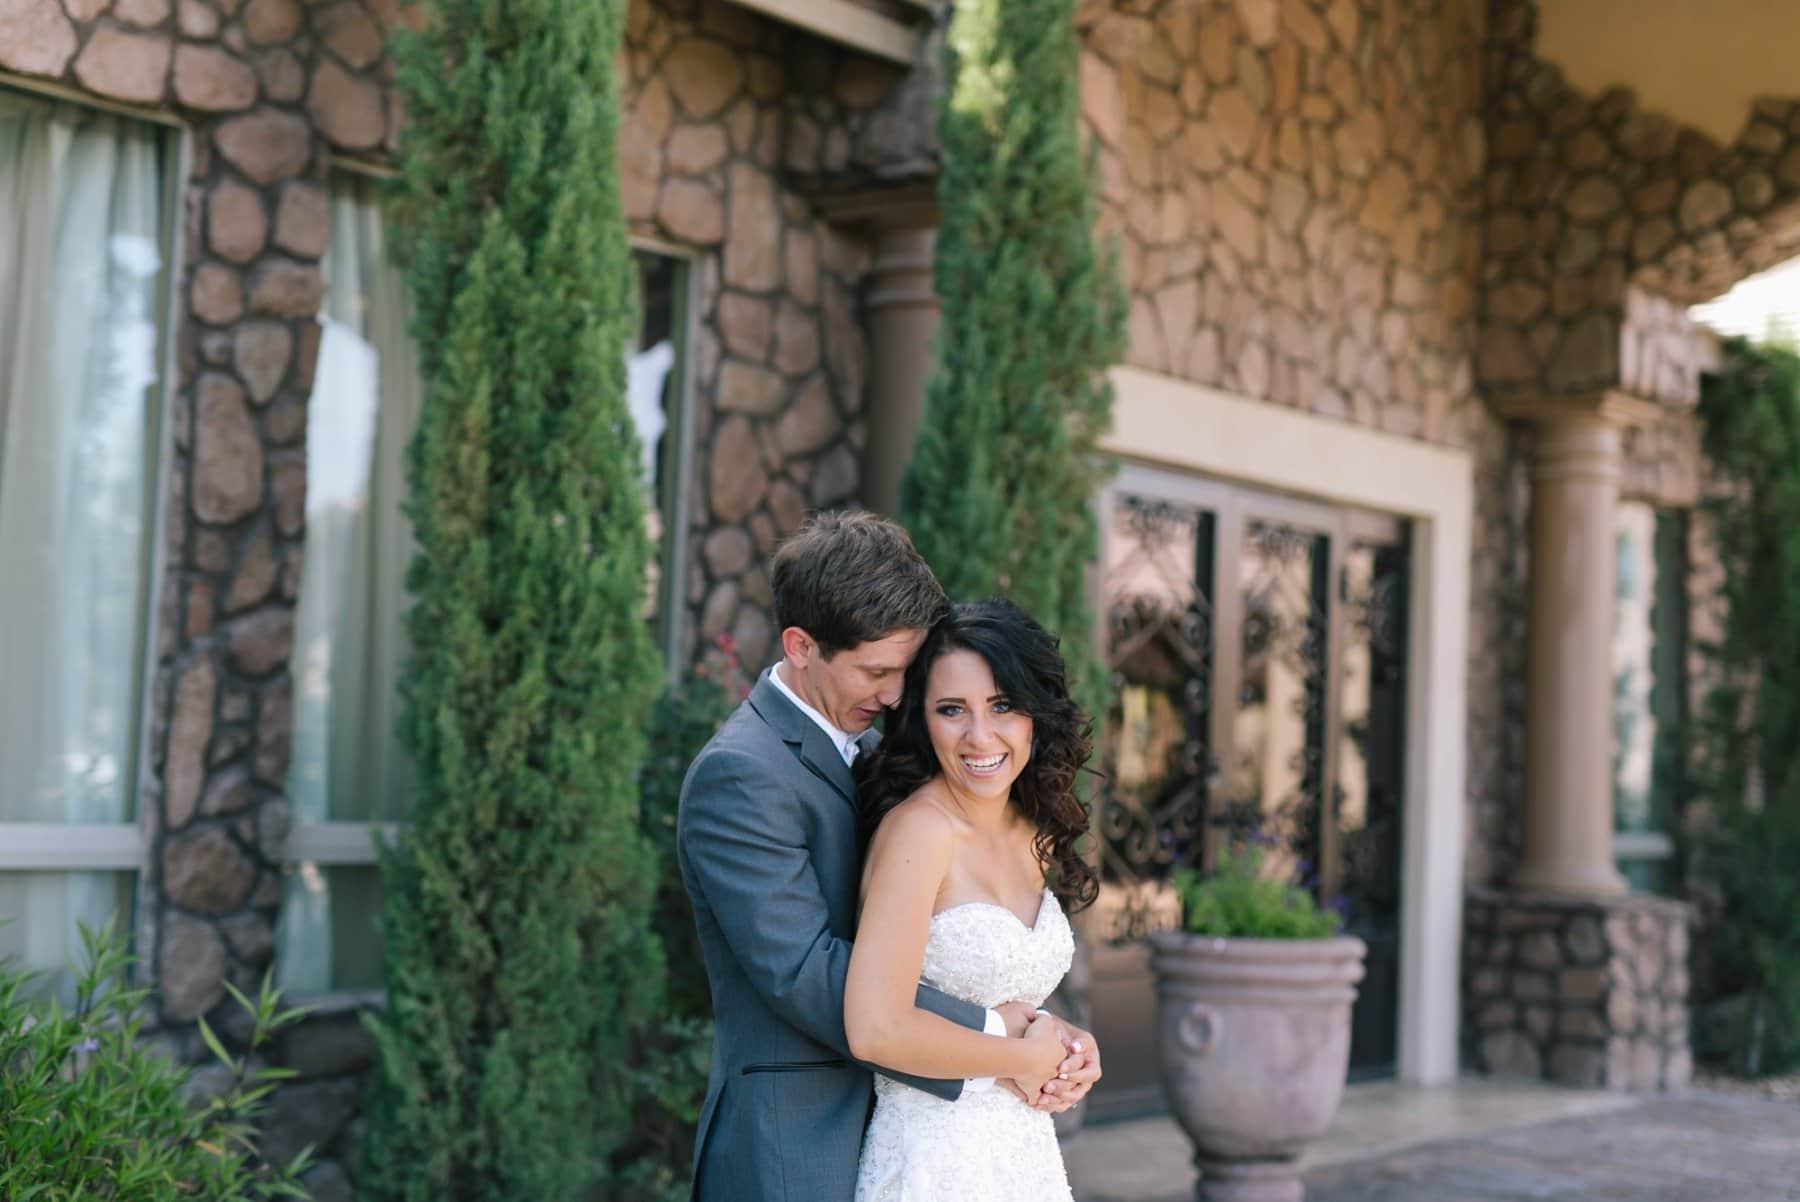 Superstition Manor Mesa AZ bride & groom photos